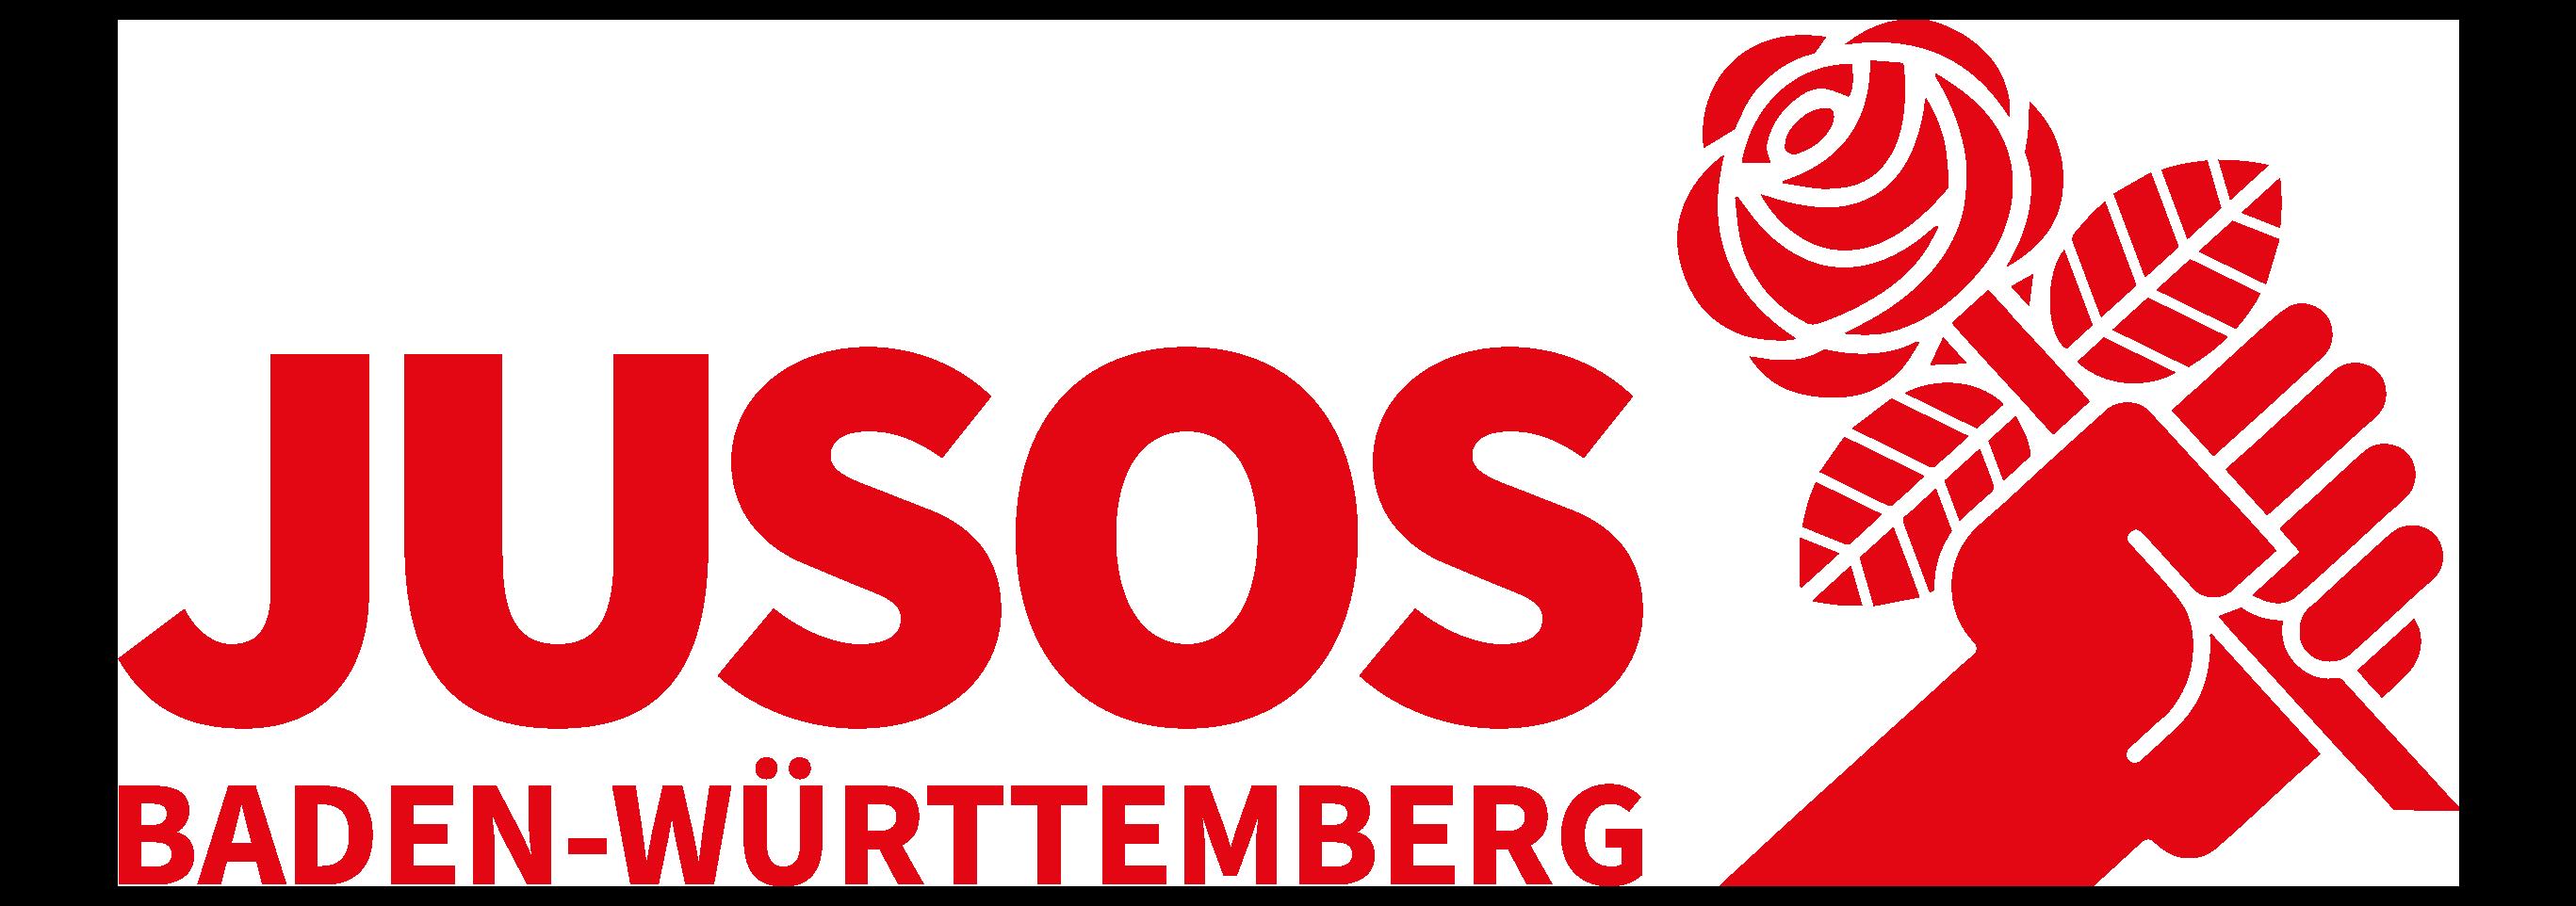 Jusos Baden-Württemberg